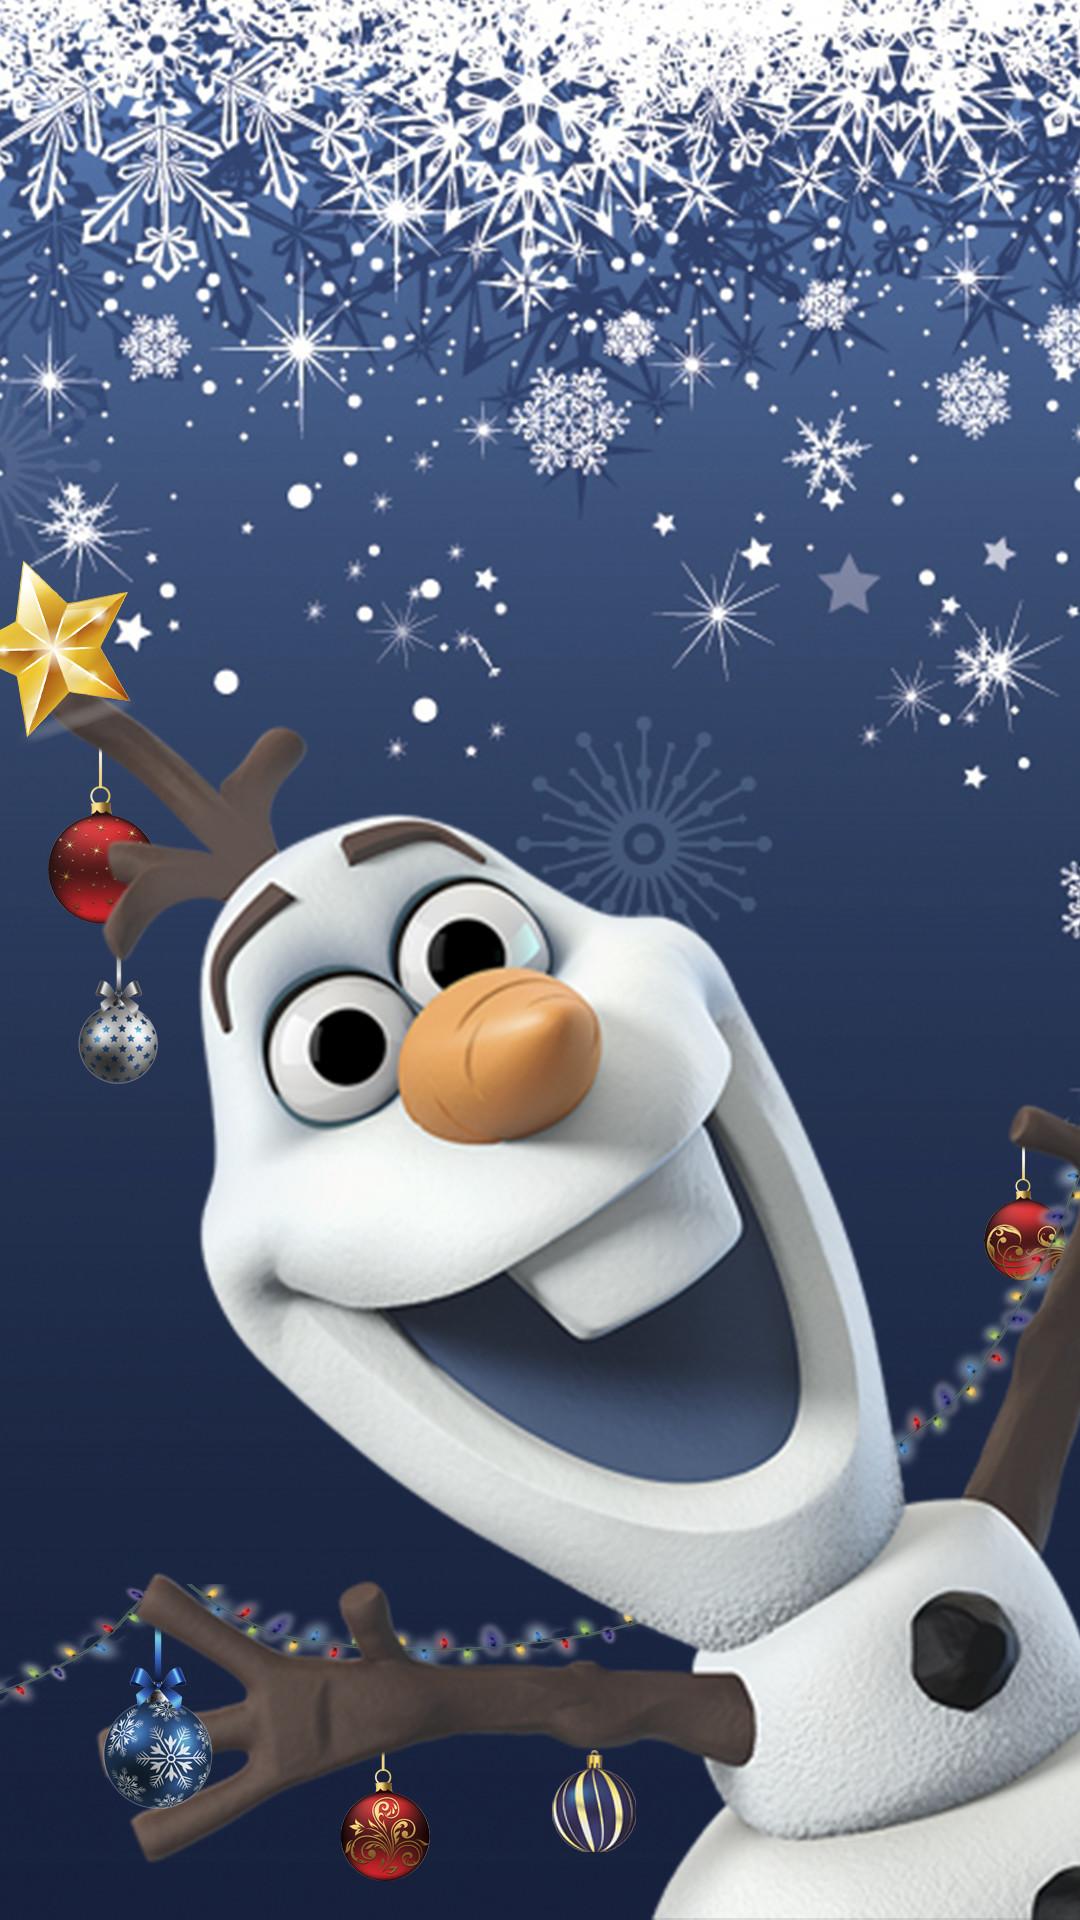 Disney Frozen Christmas Tree